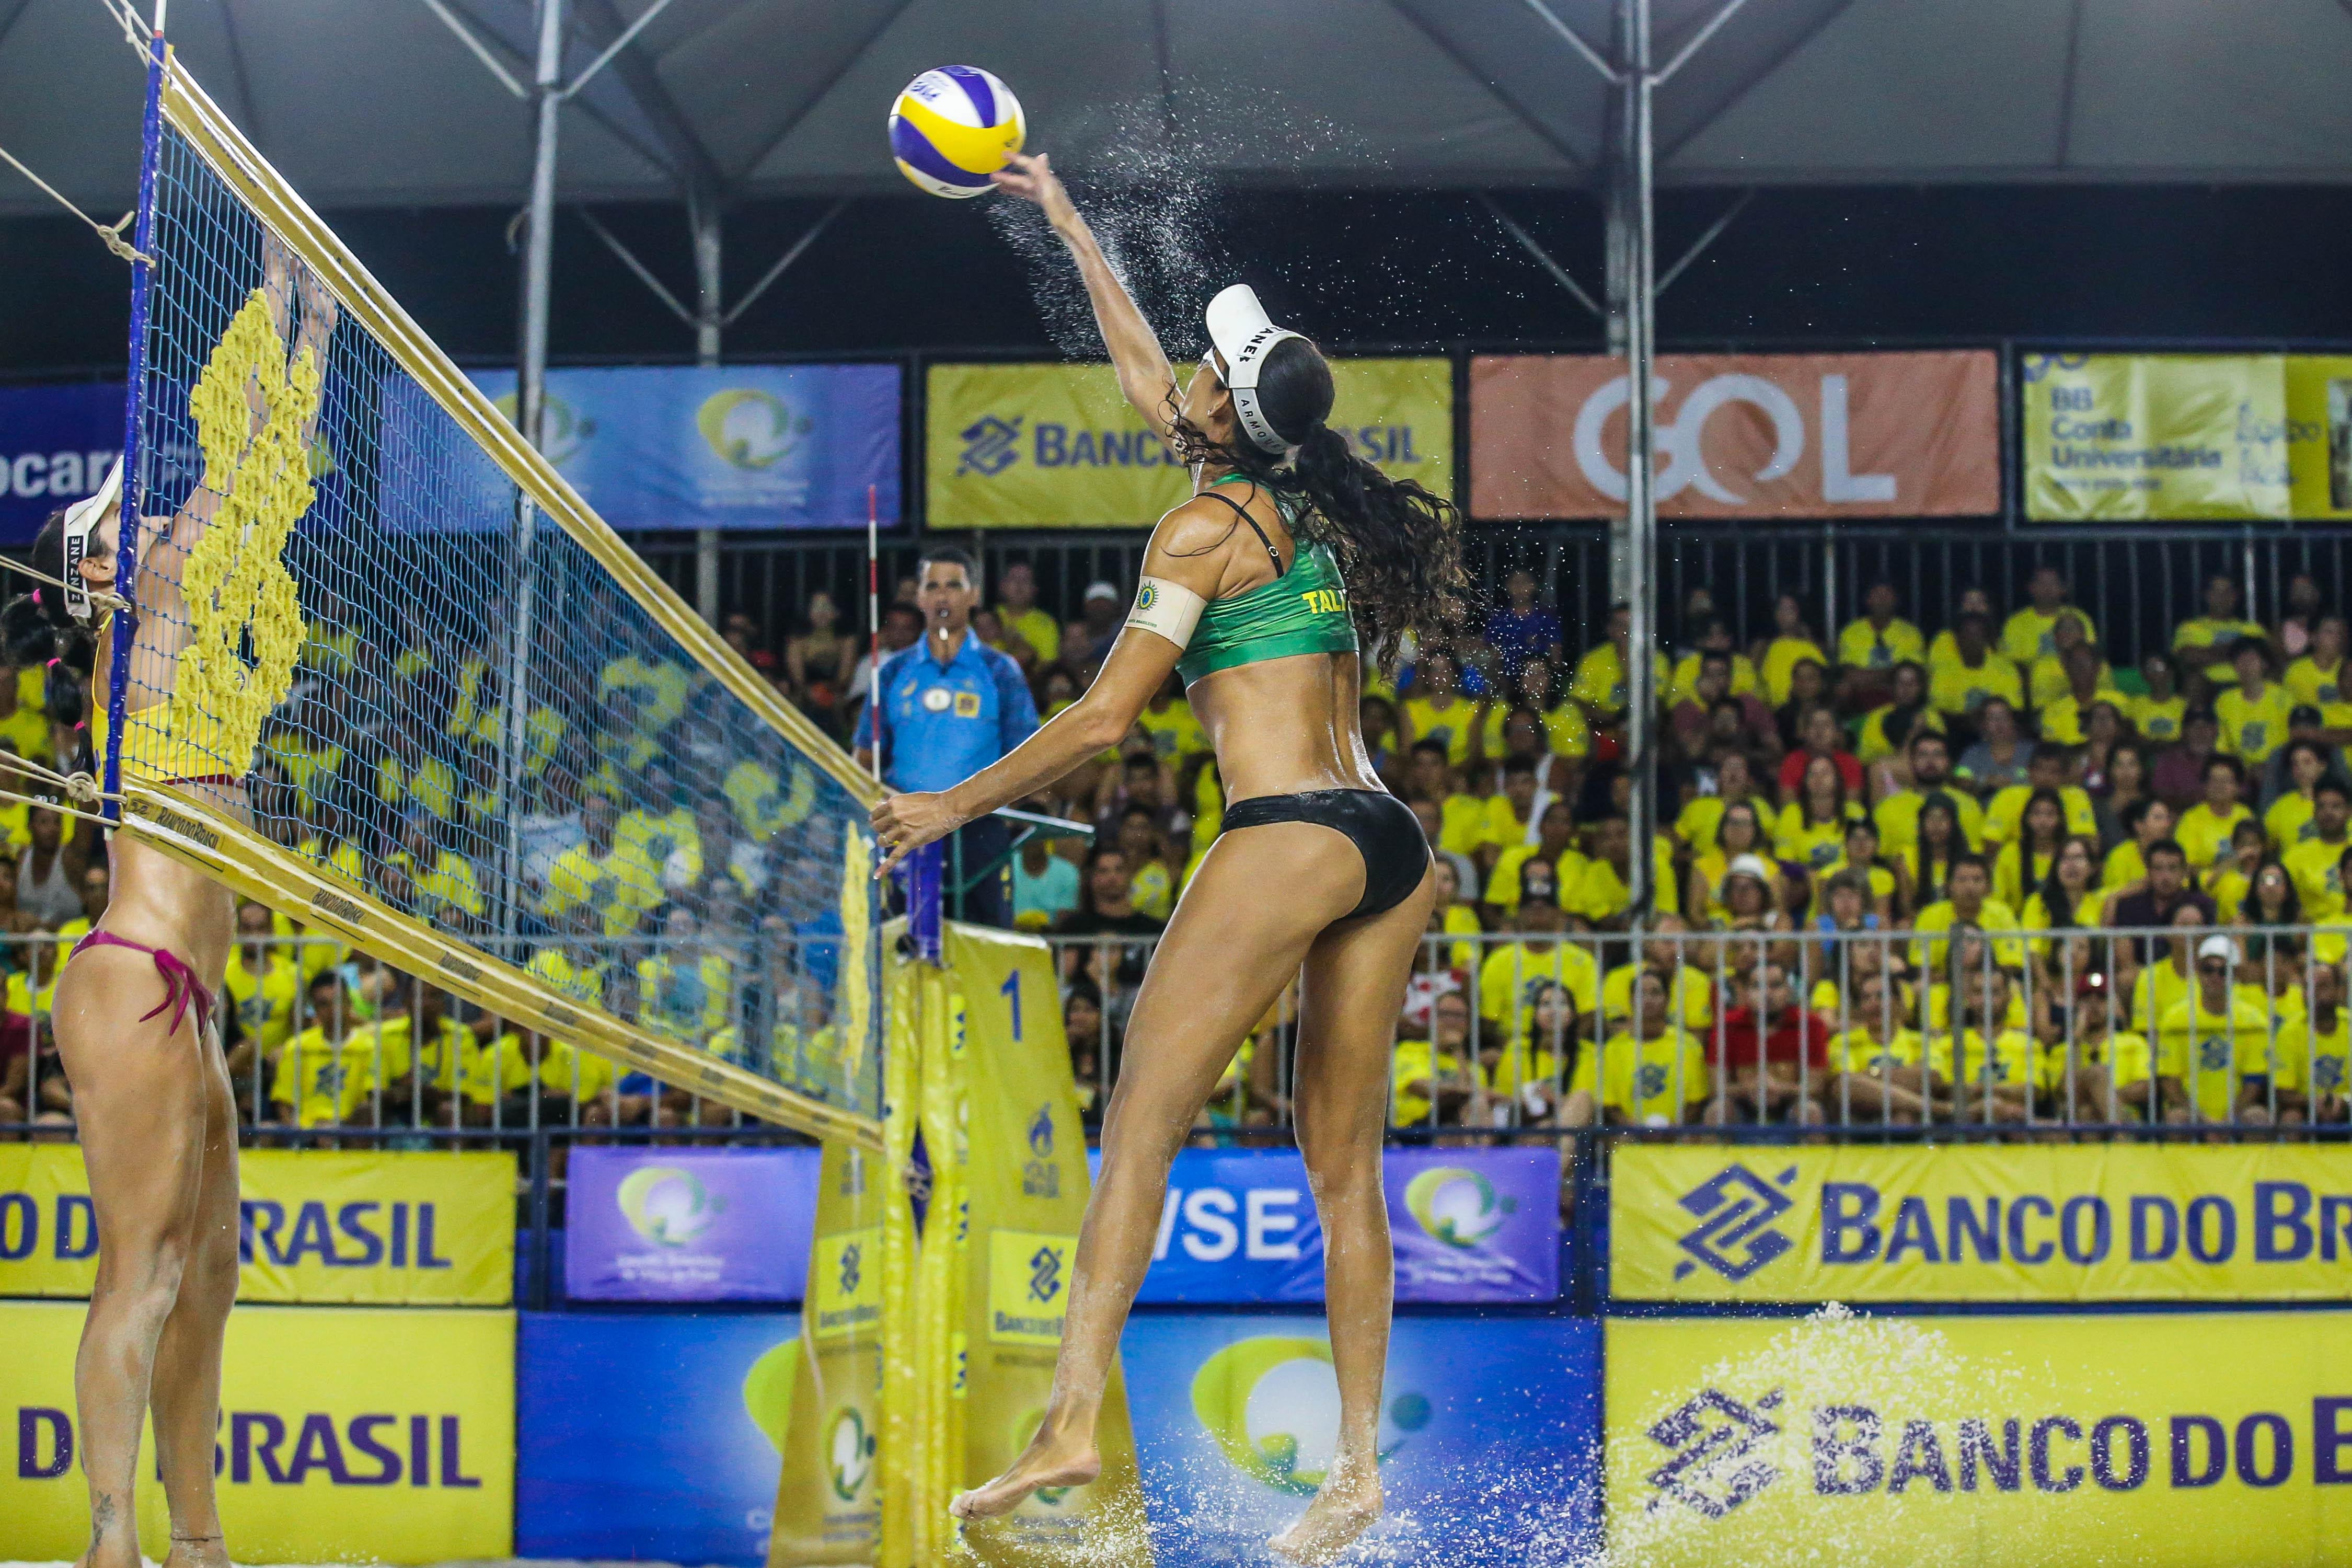 Ana Patrícia/Rebecca enfrenta Talita/Carol Solberg pelo título em Aracaju (SE)